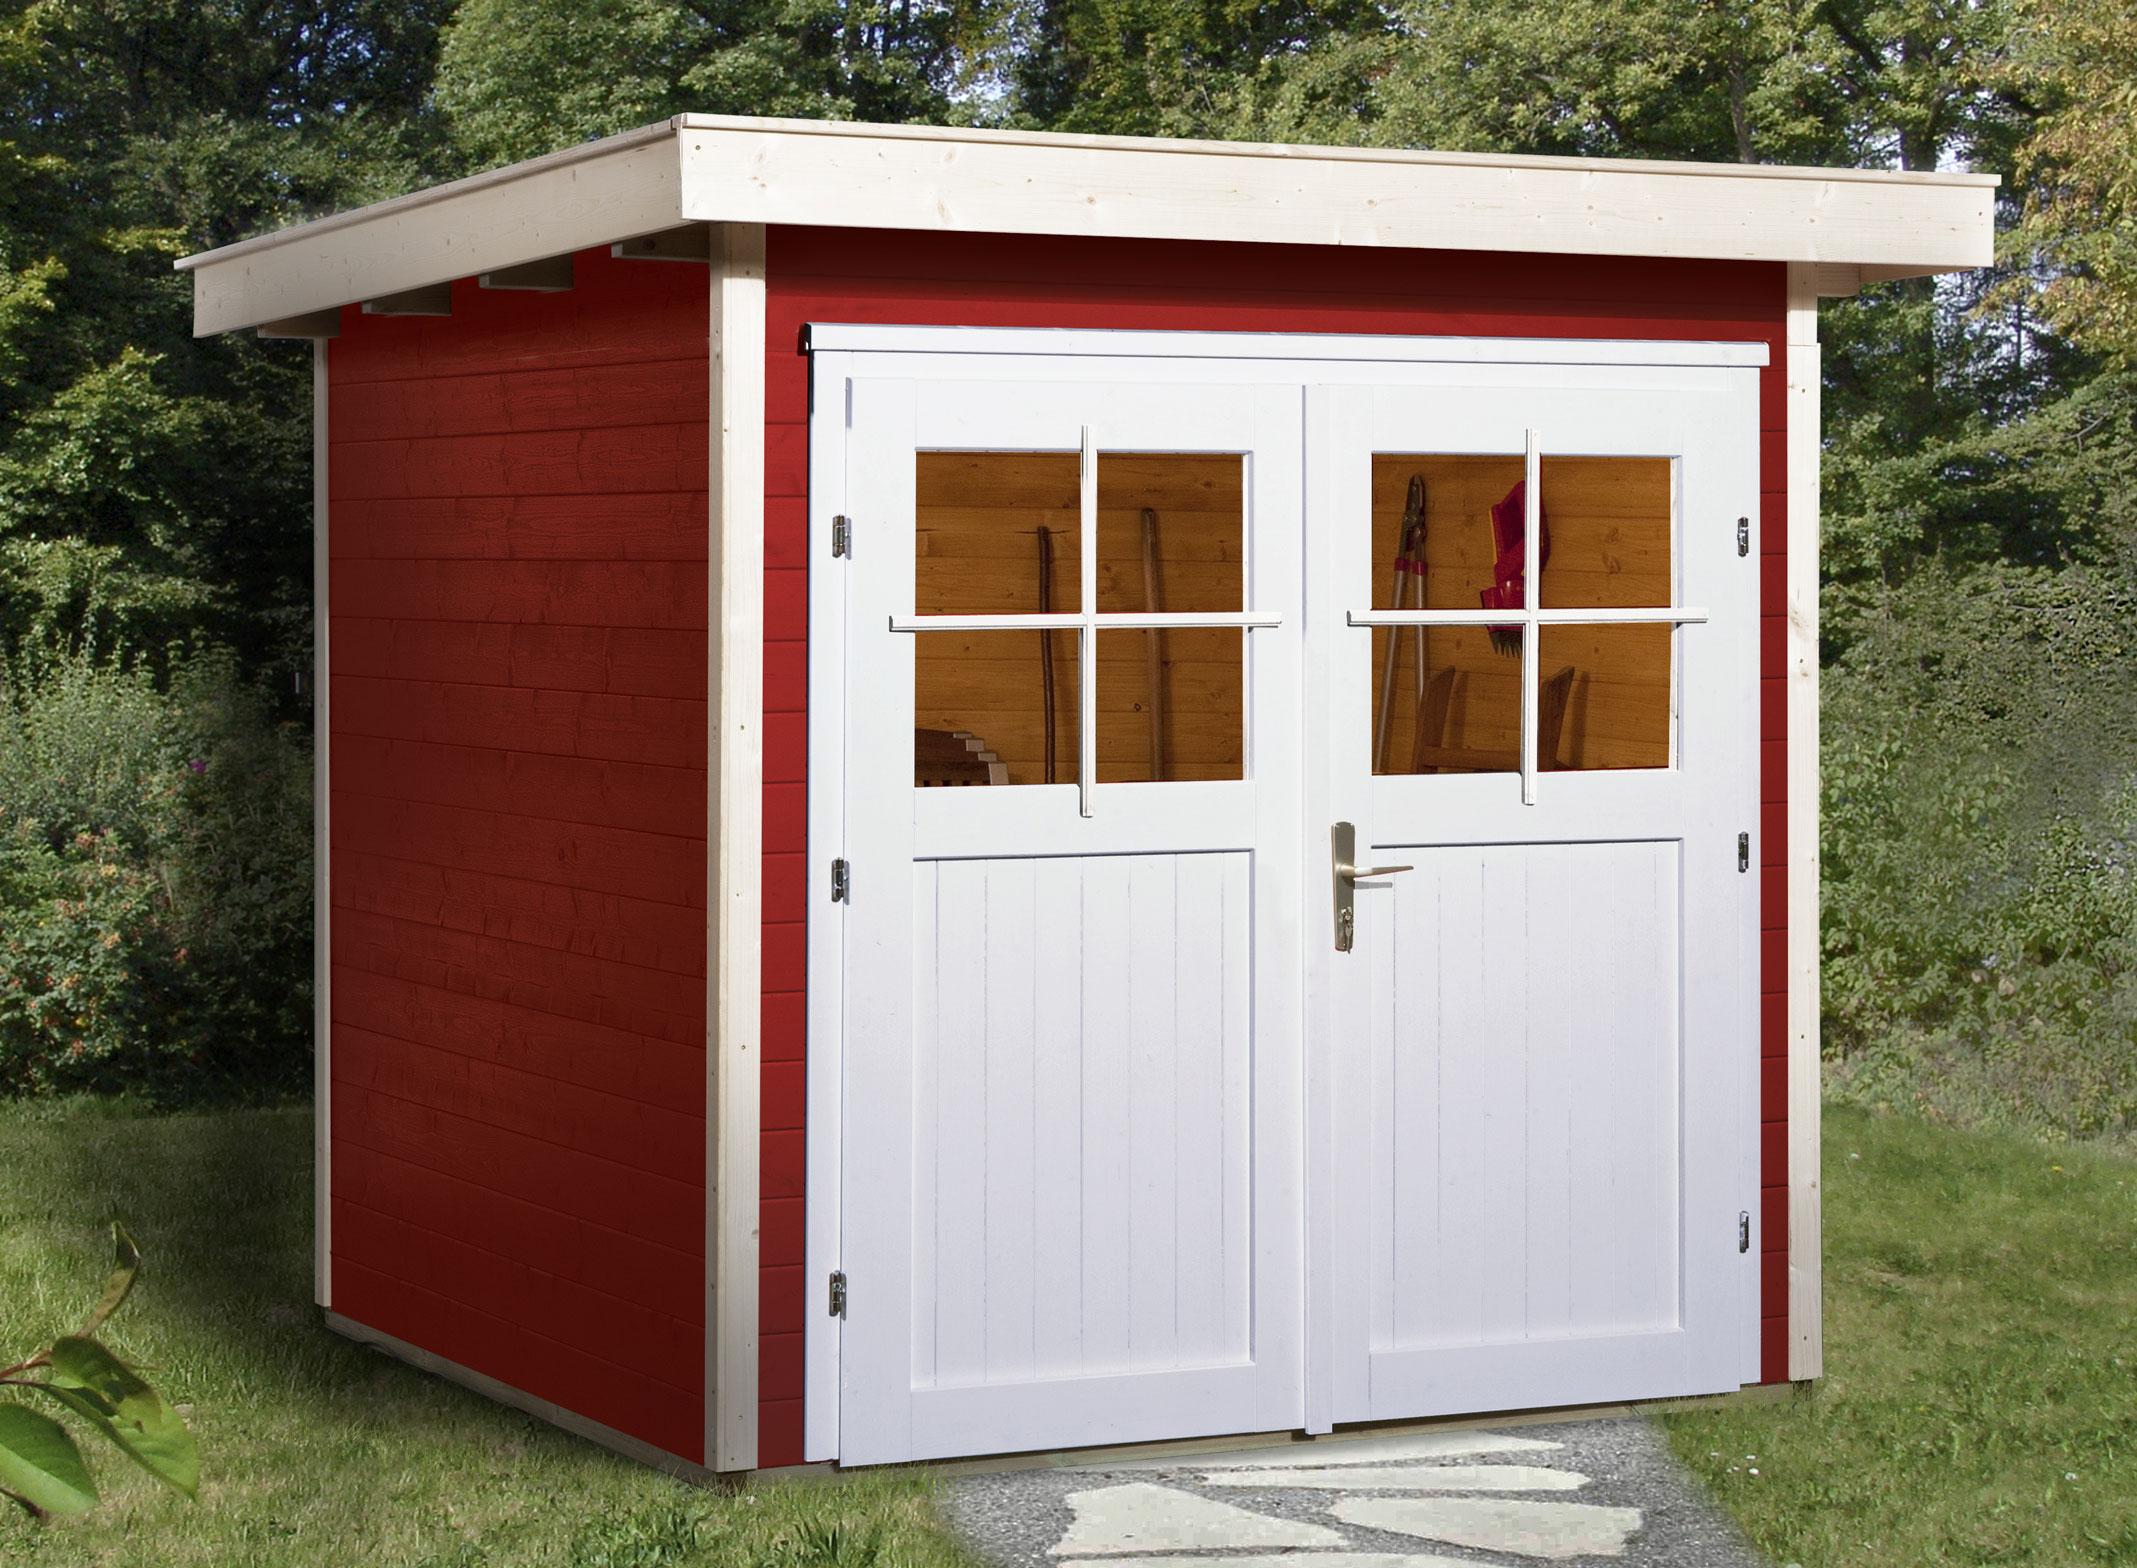 weka ger tehaus 21 mm gartenhaus 227 gr 1 rot 225x249cm bei. Black Bedroom Furniture Sets. Home Design Ideas